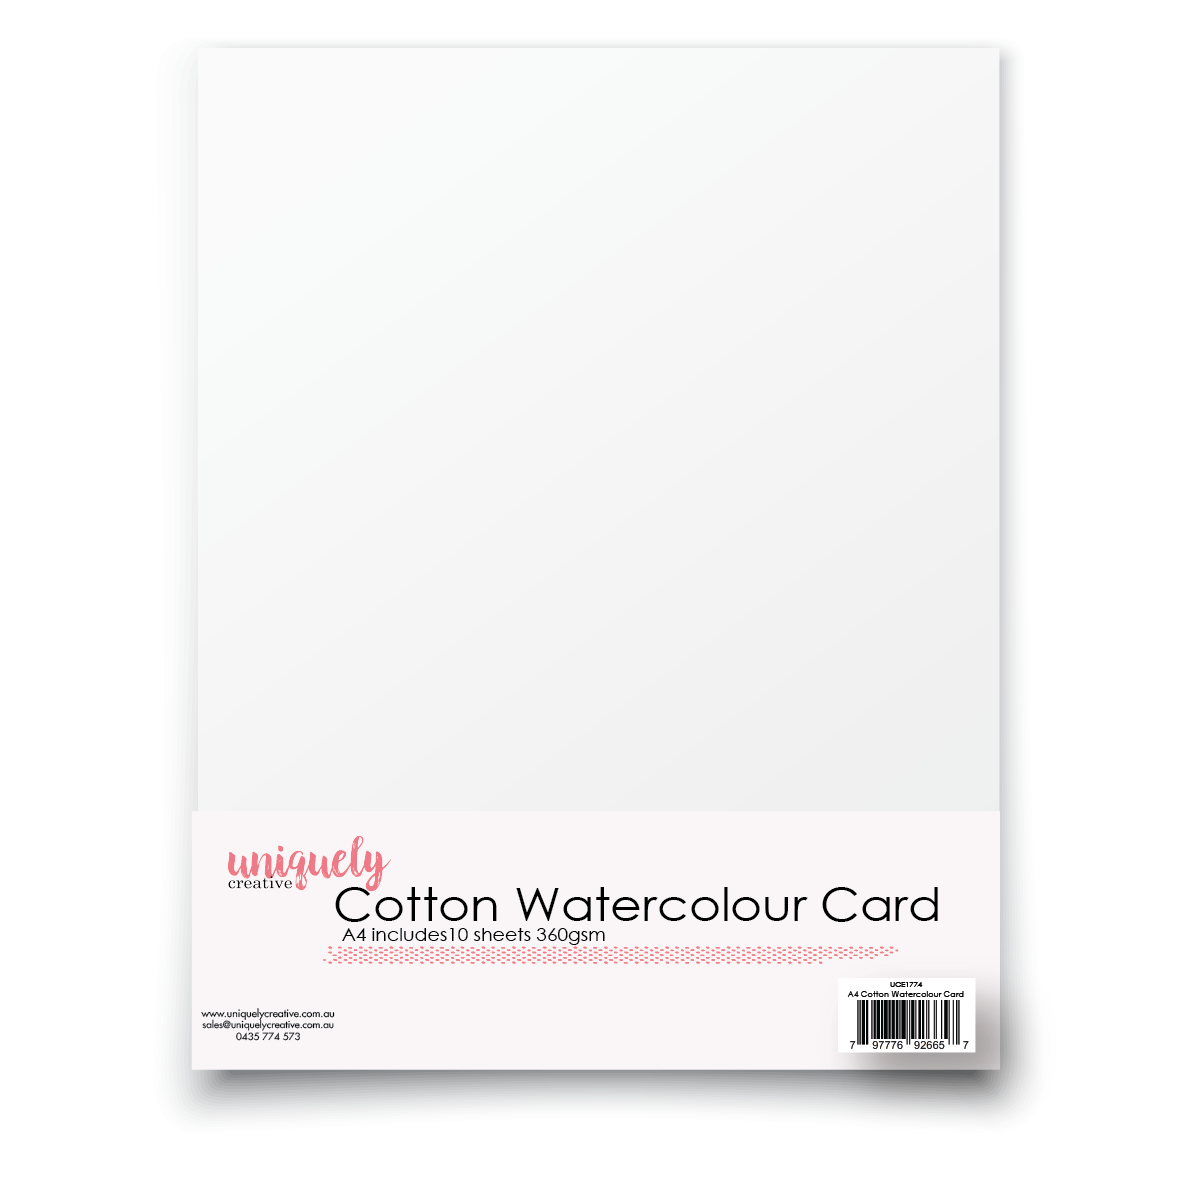 Uniquely Creative - A4 Cotton Watercolour Card